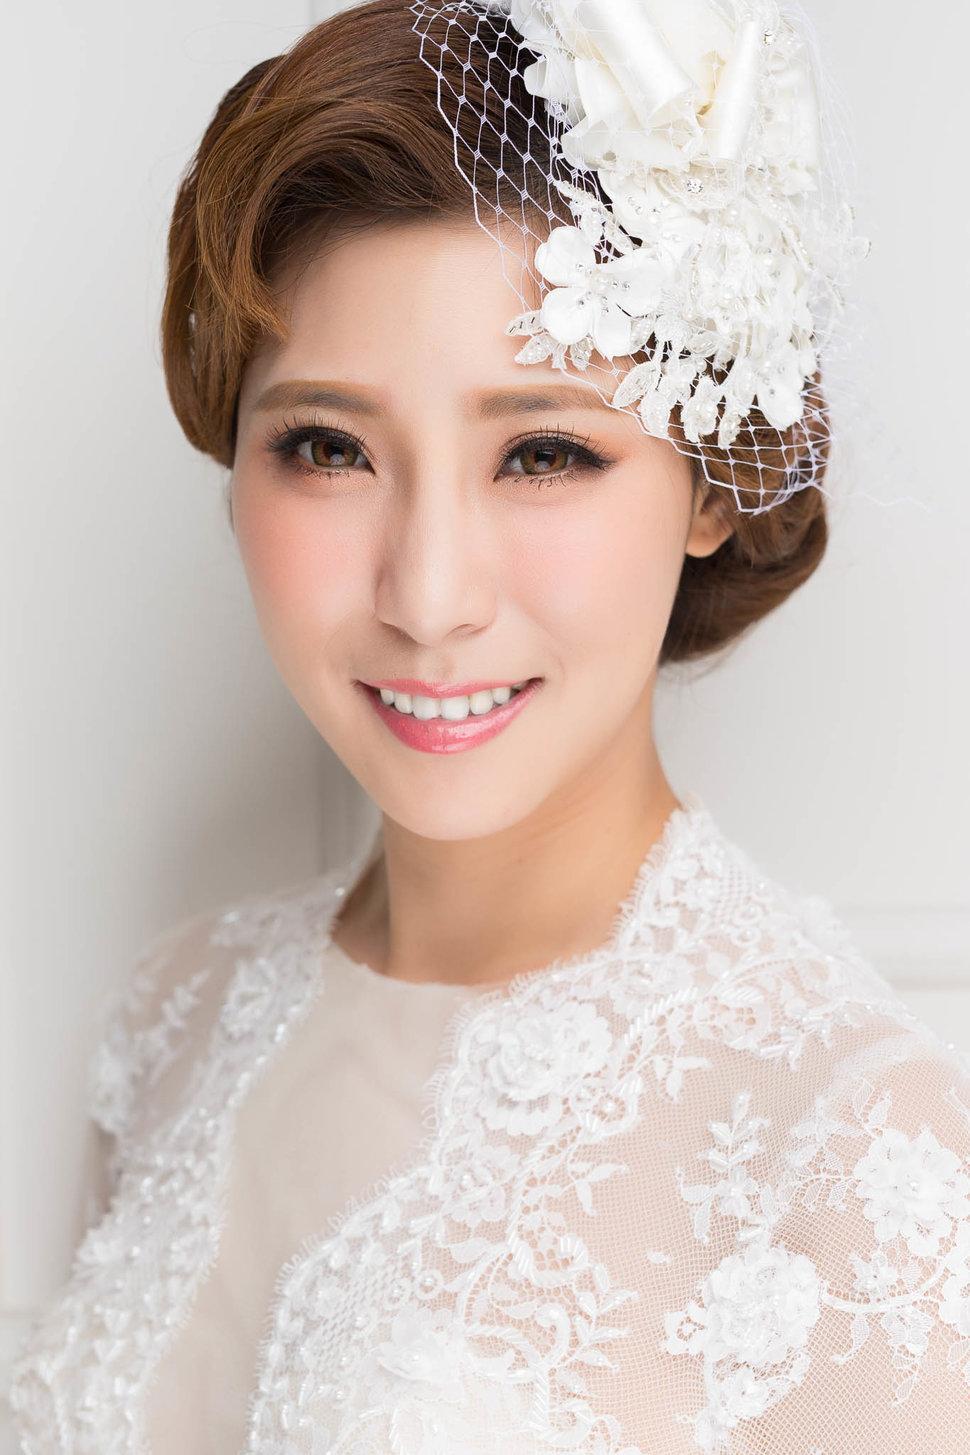 18PHOTO自主婚紗-潤兒(編號:406259) - 18PHOTO 婚紗影像攝影工作室 - 結婚吧一站式婚禮服務平台